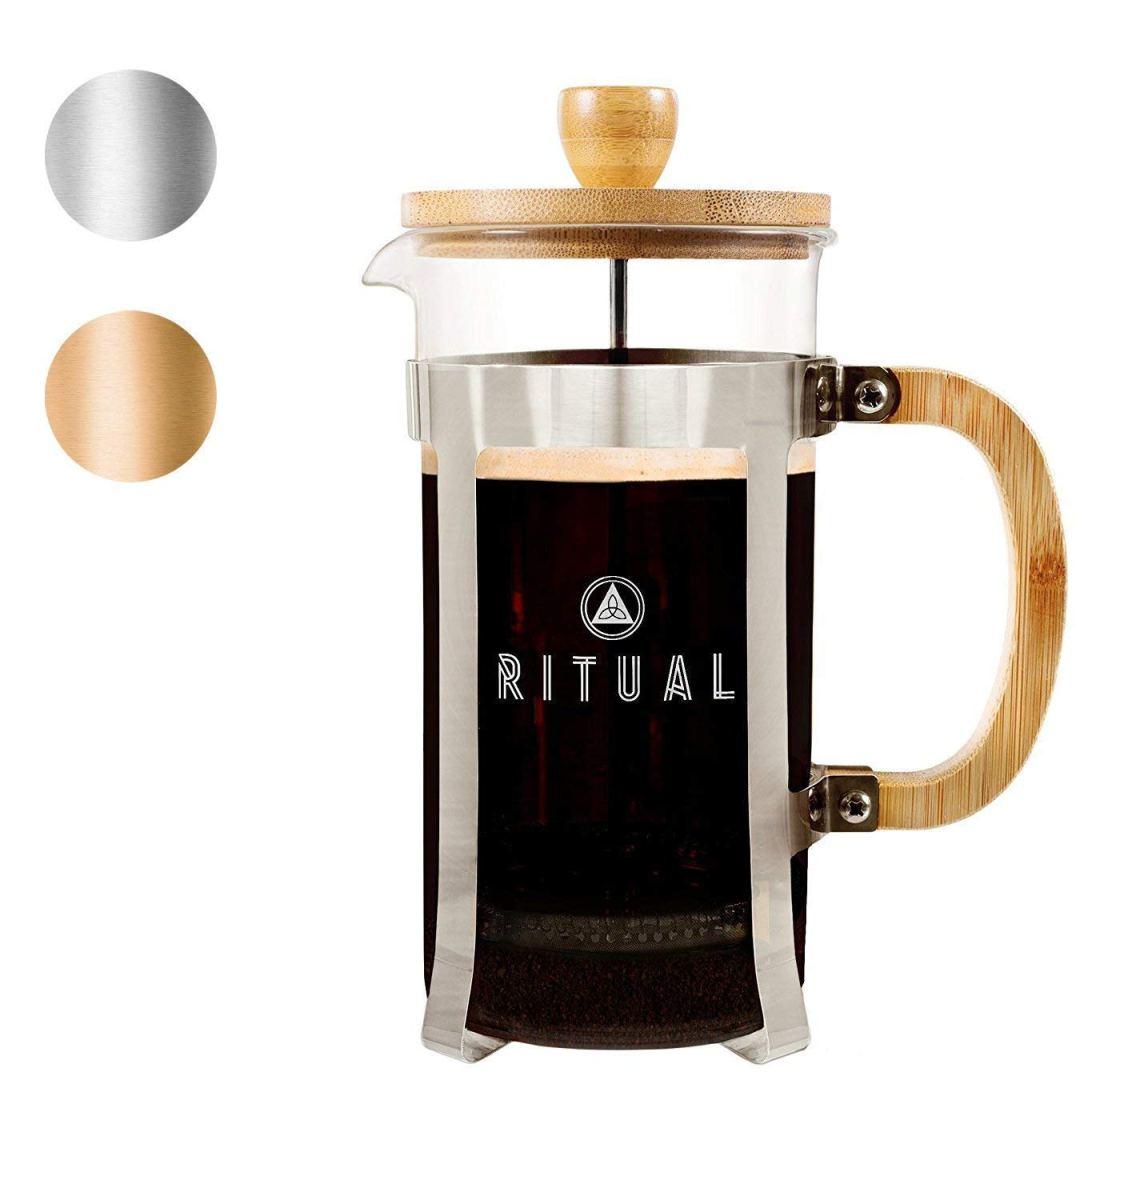 Retual French Coffee Press